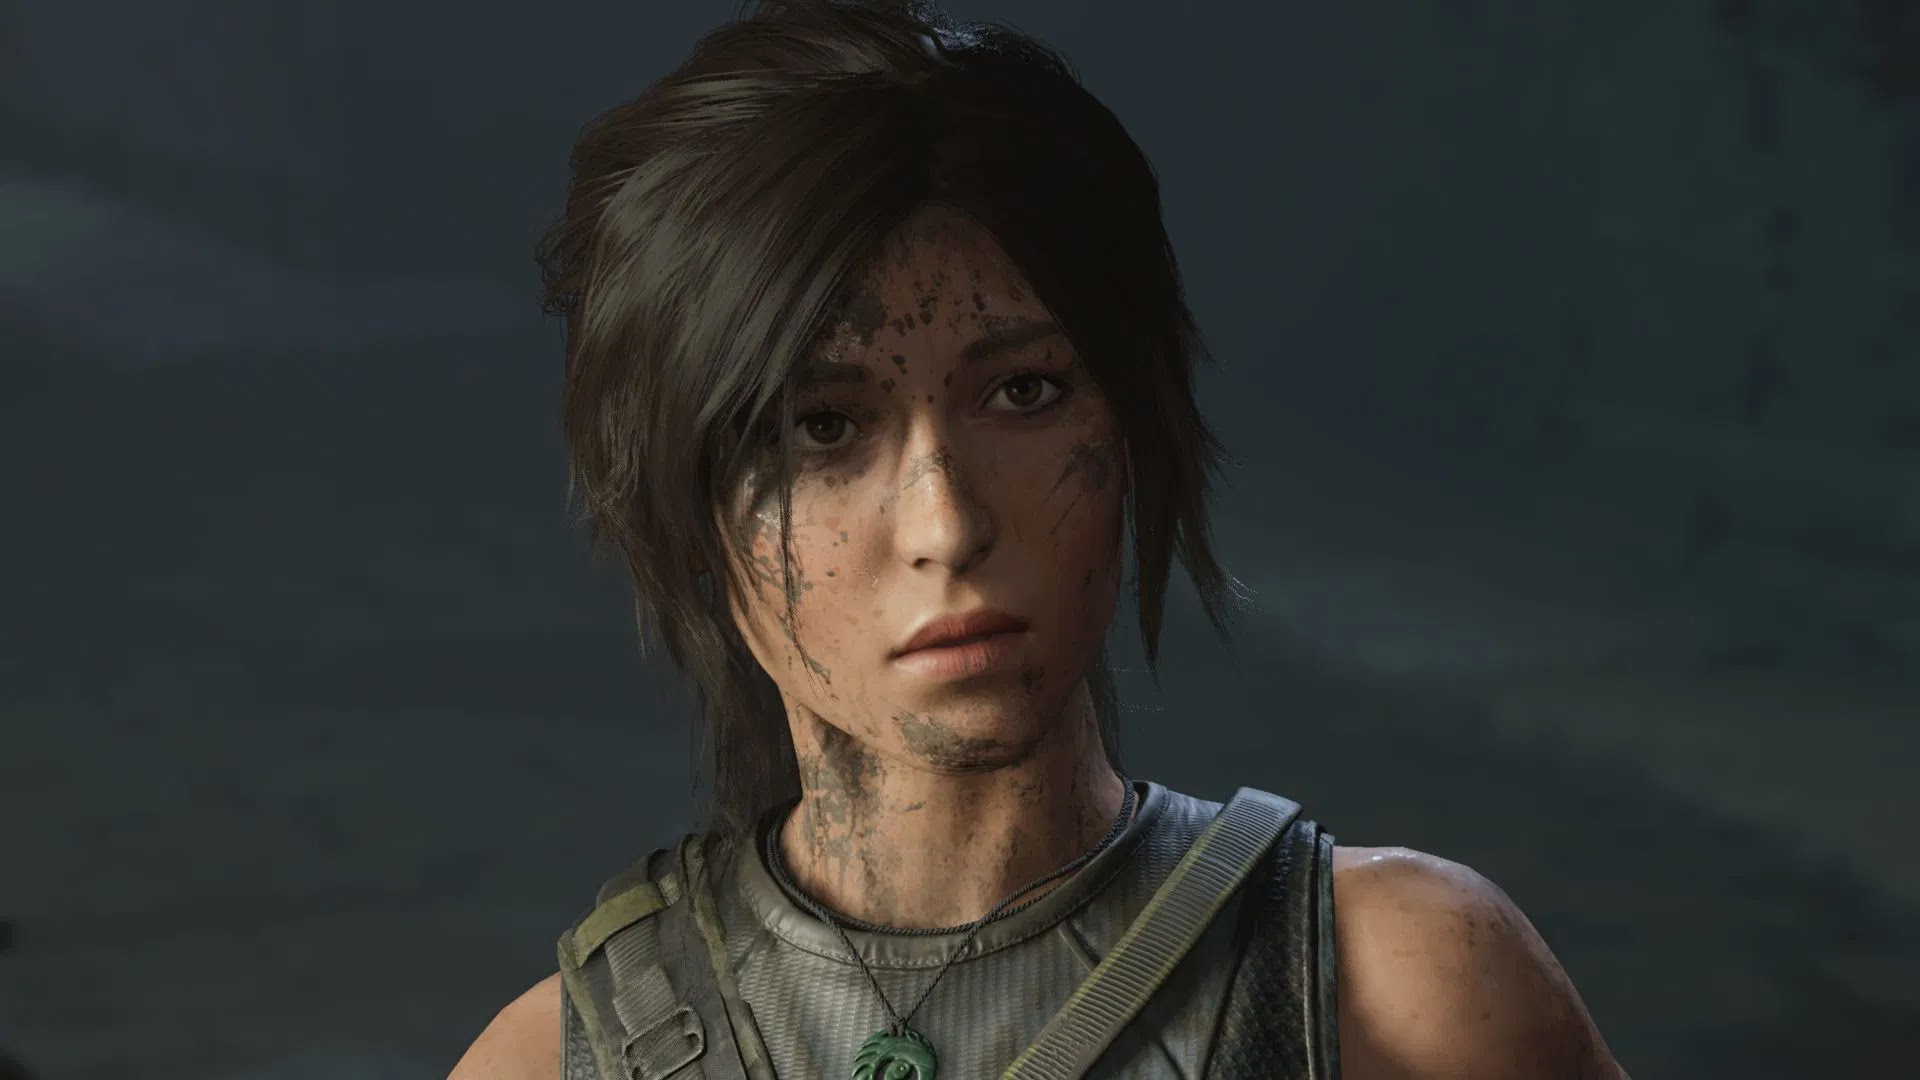 Lara Croft is celebrating 25 years